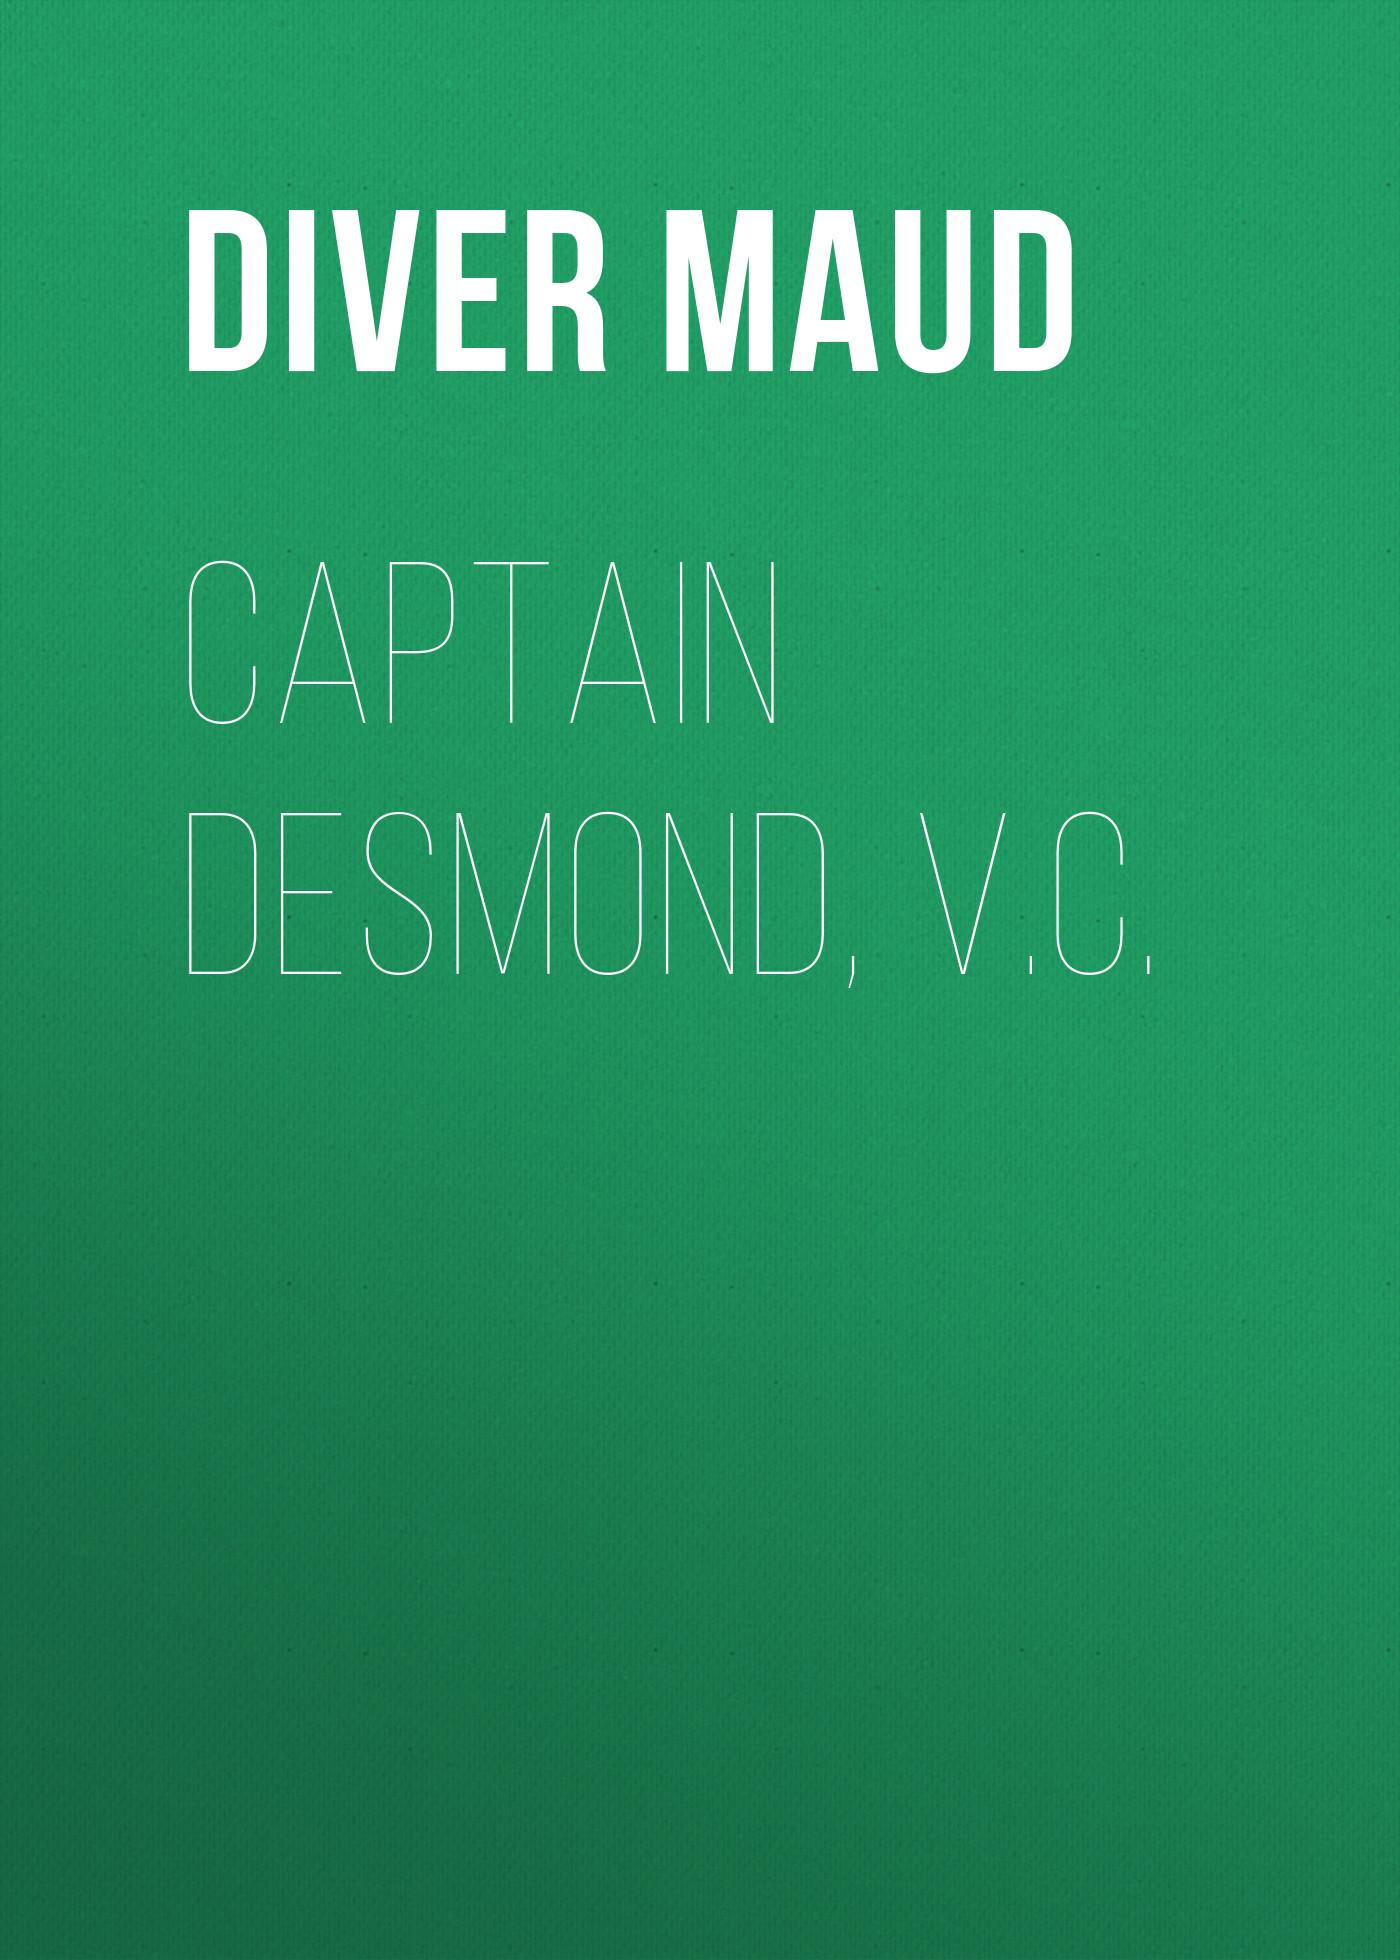 Diver Maud Captain Desmond, V.C. maud h yardley nor all your tears